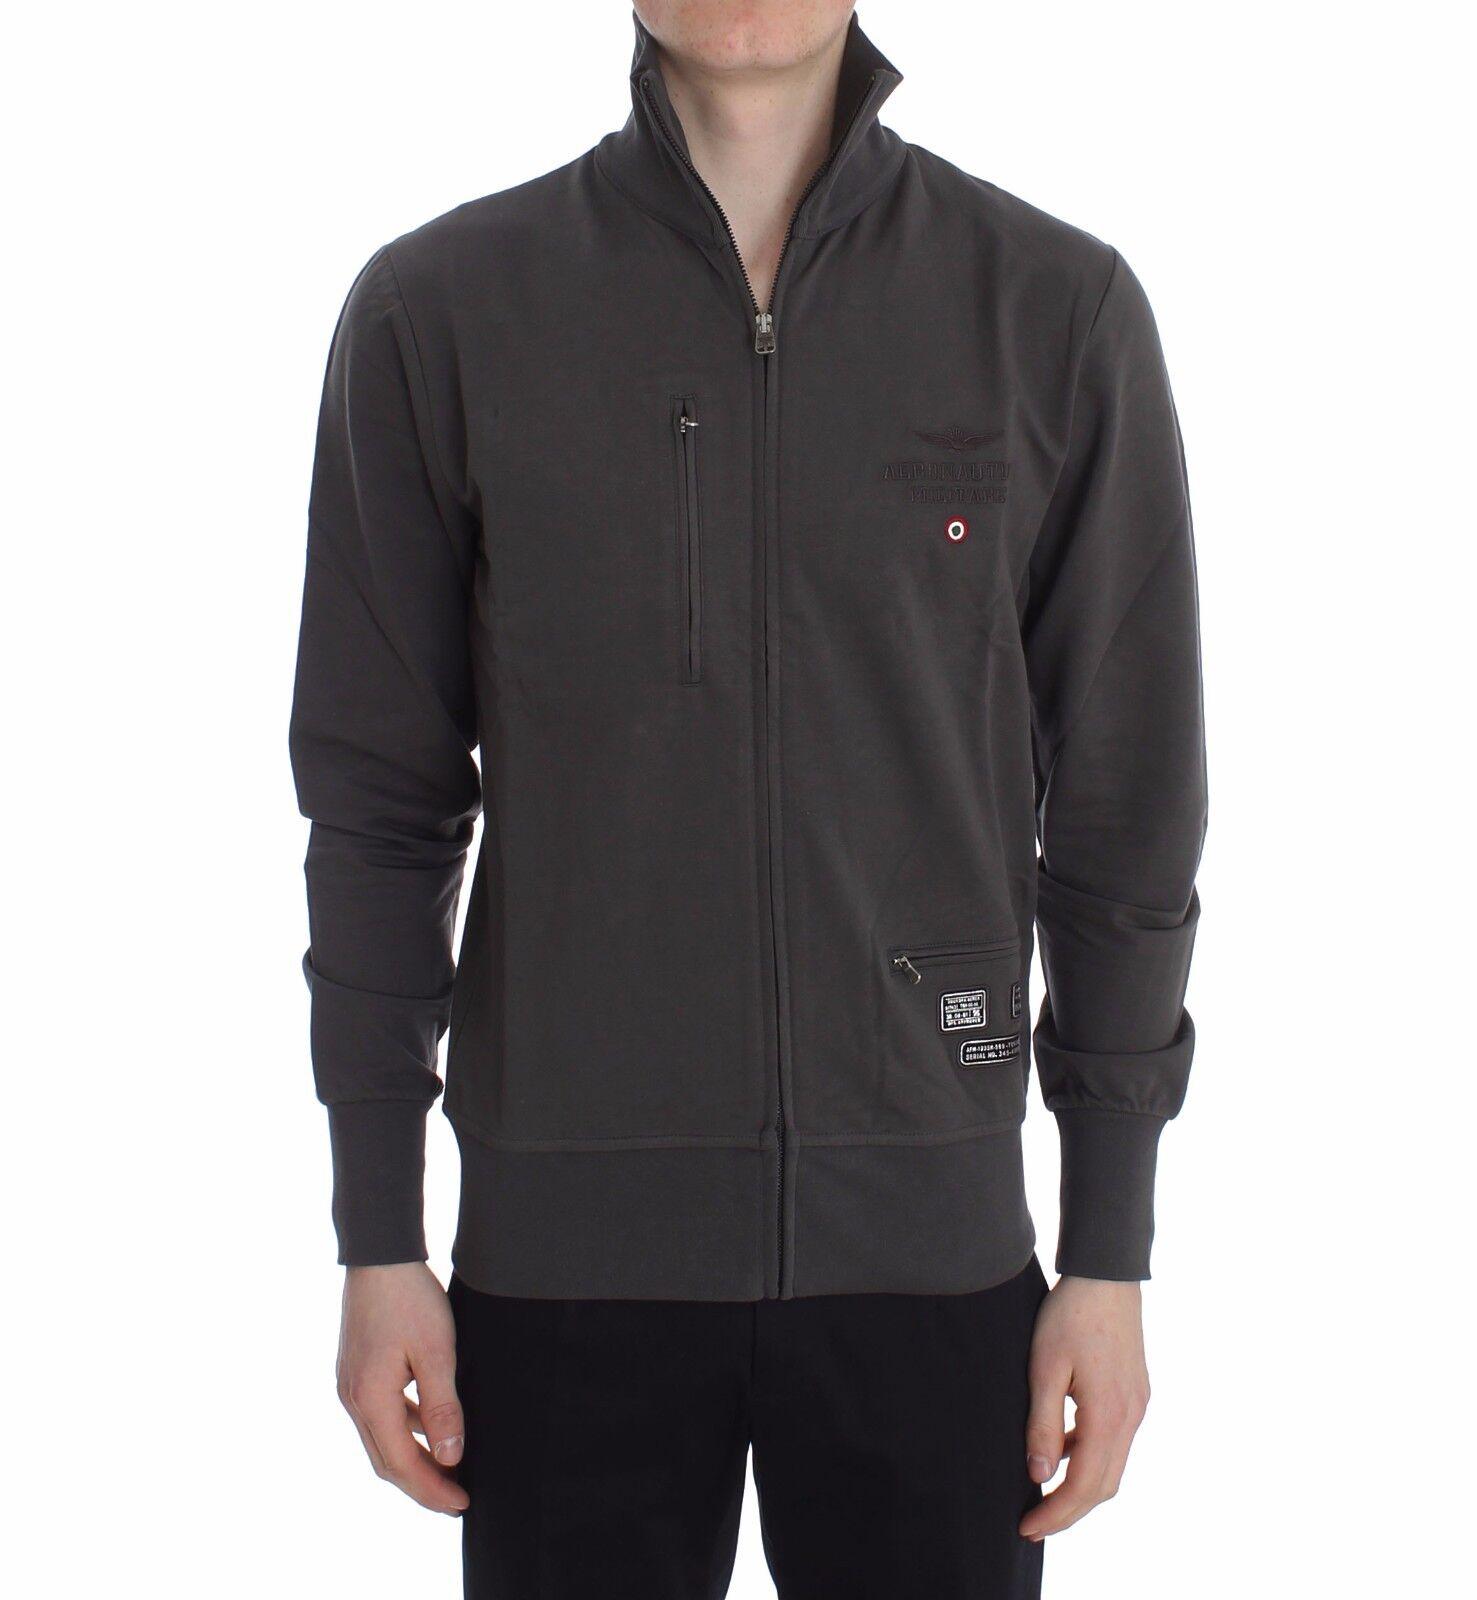 NEW AERONAUTICA MILITARE Sweater grau Cotton Stretch Full Zipper  Herren Top s. S